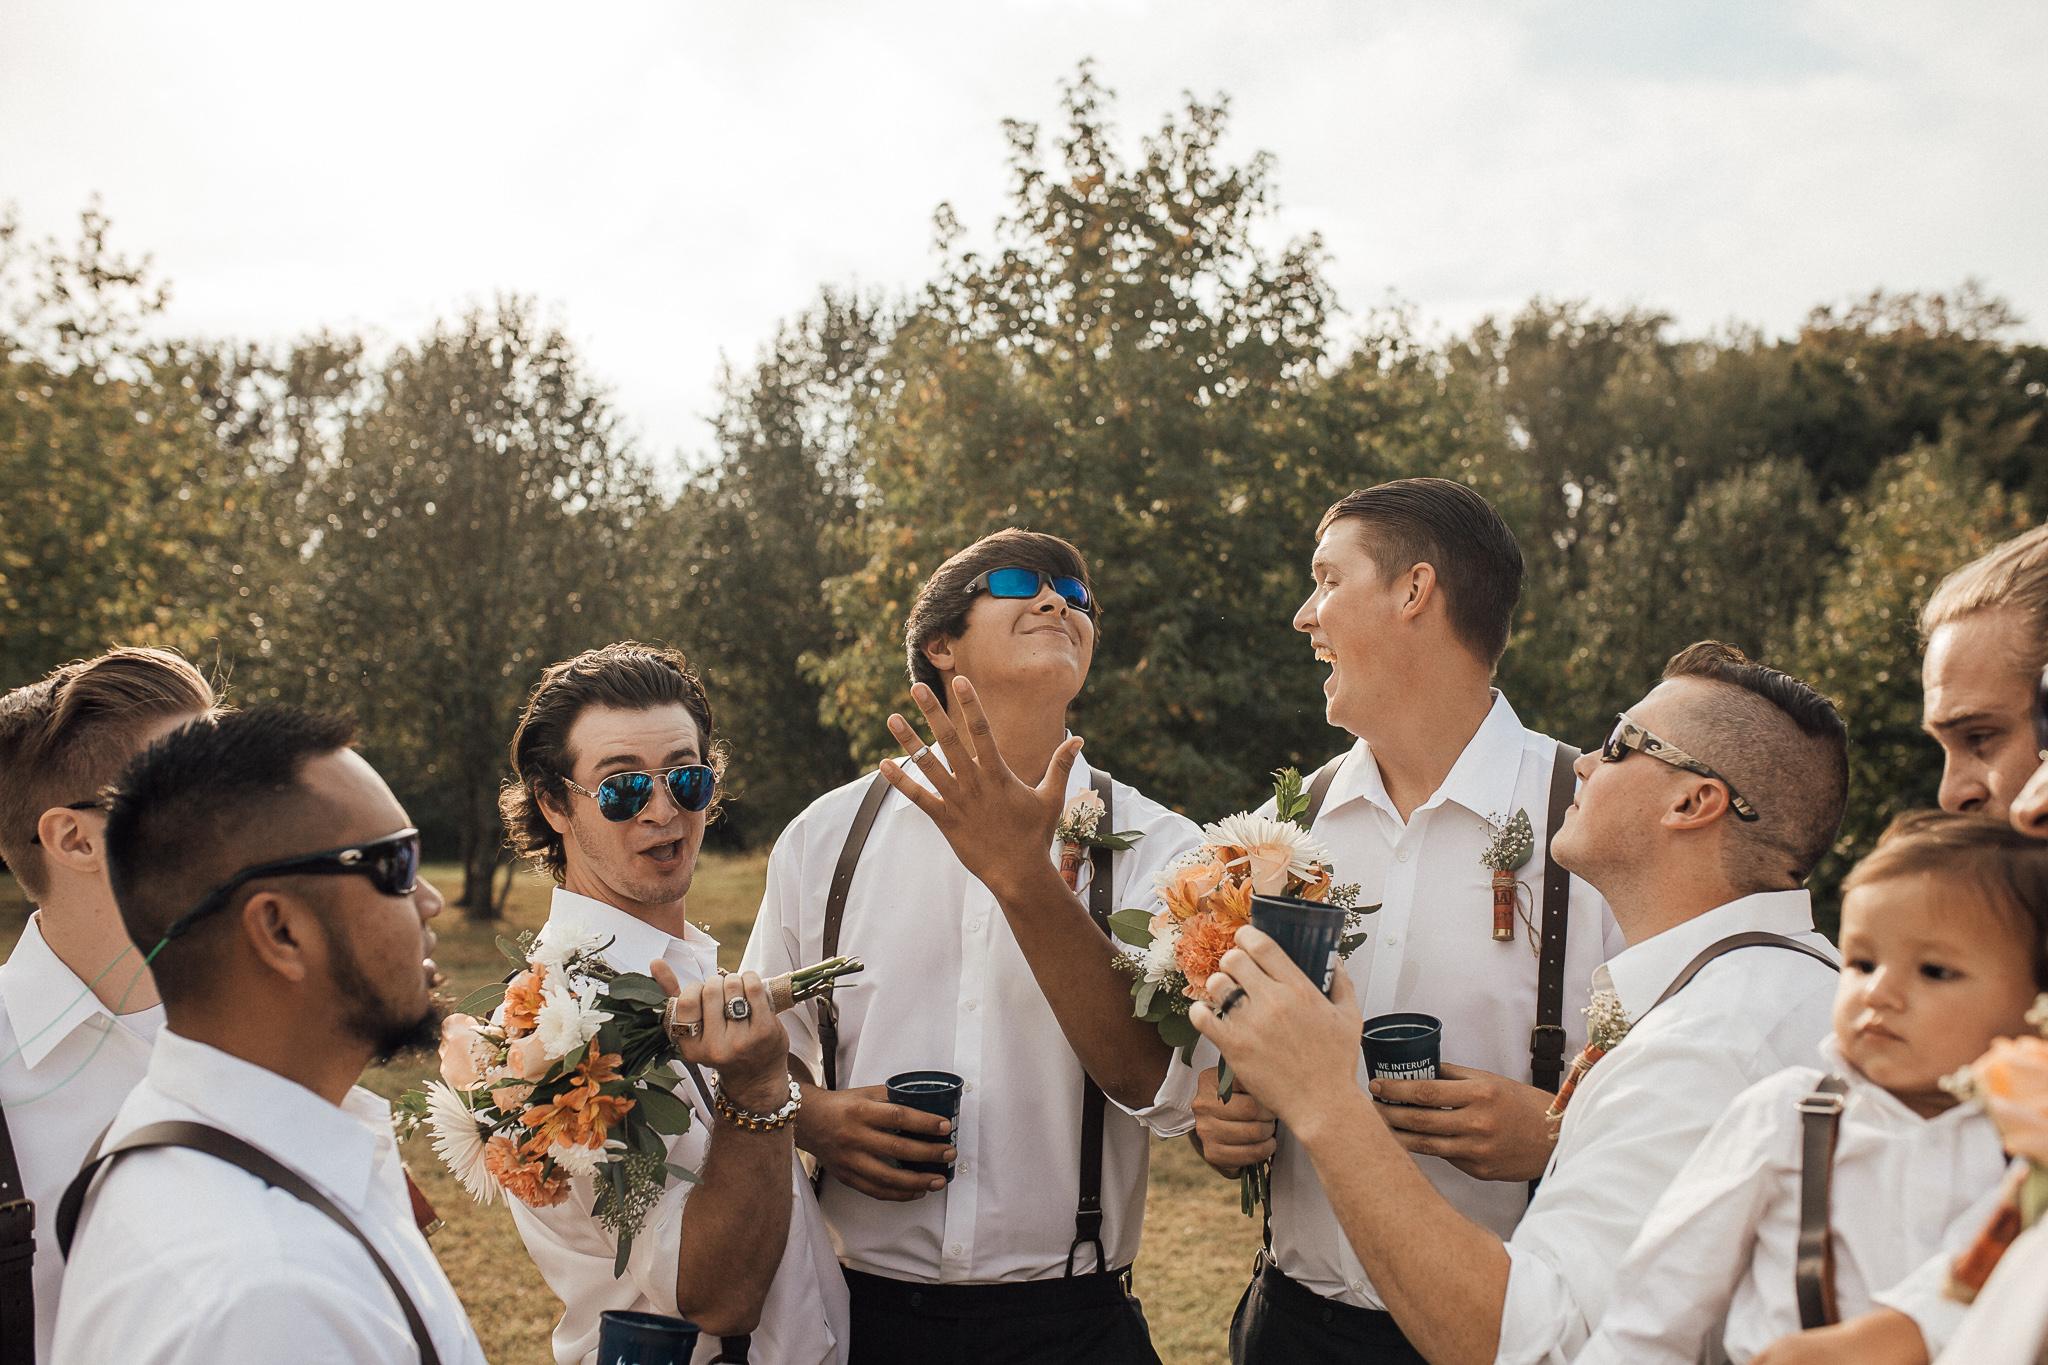 cassie-cook-photography-the-bridge-at-chisleigh-farm-memphis-wedding-photographer